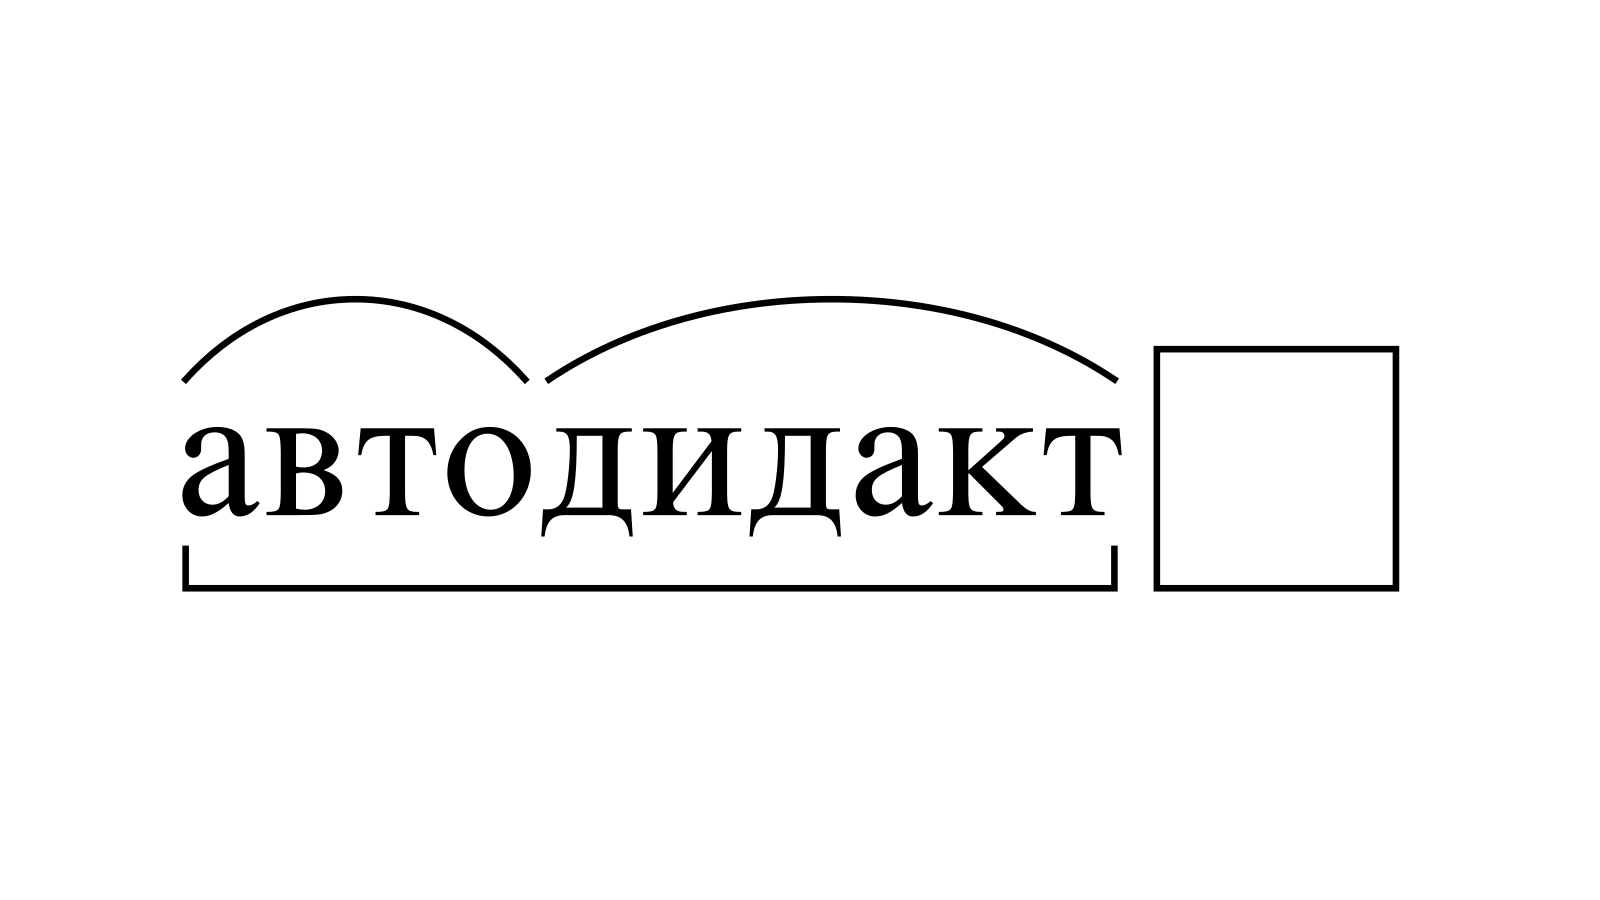 Разбор слова «автодидакт» по составу